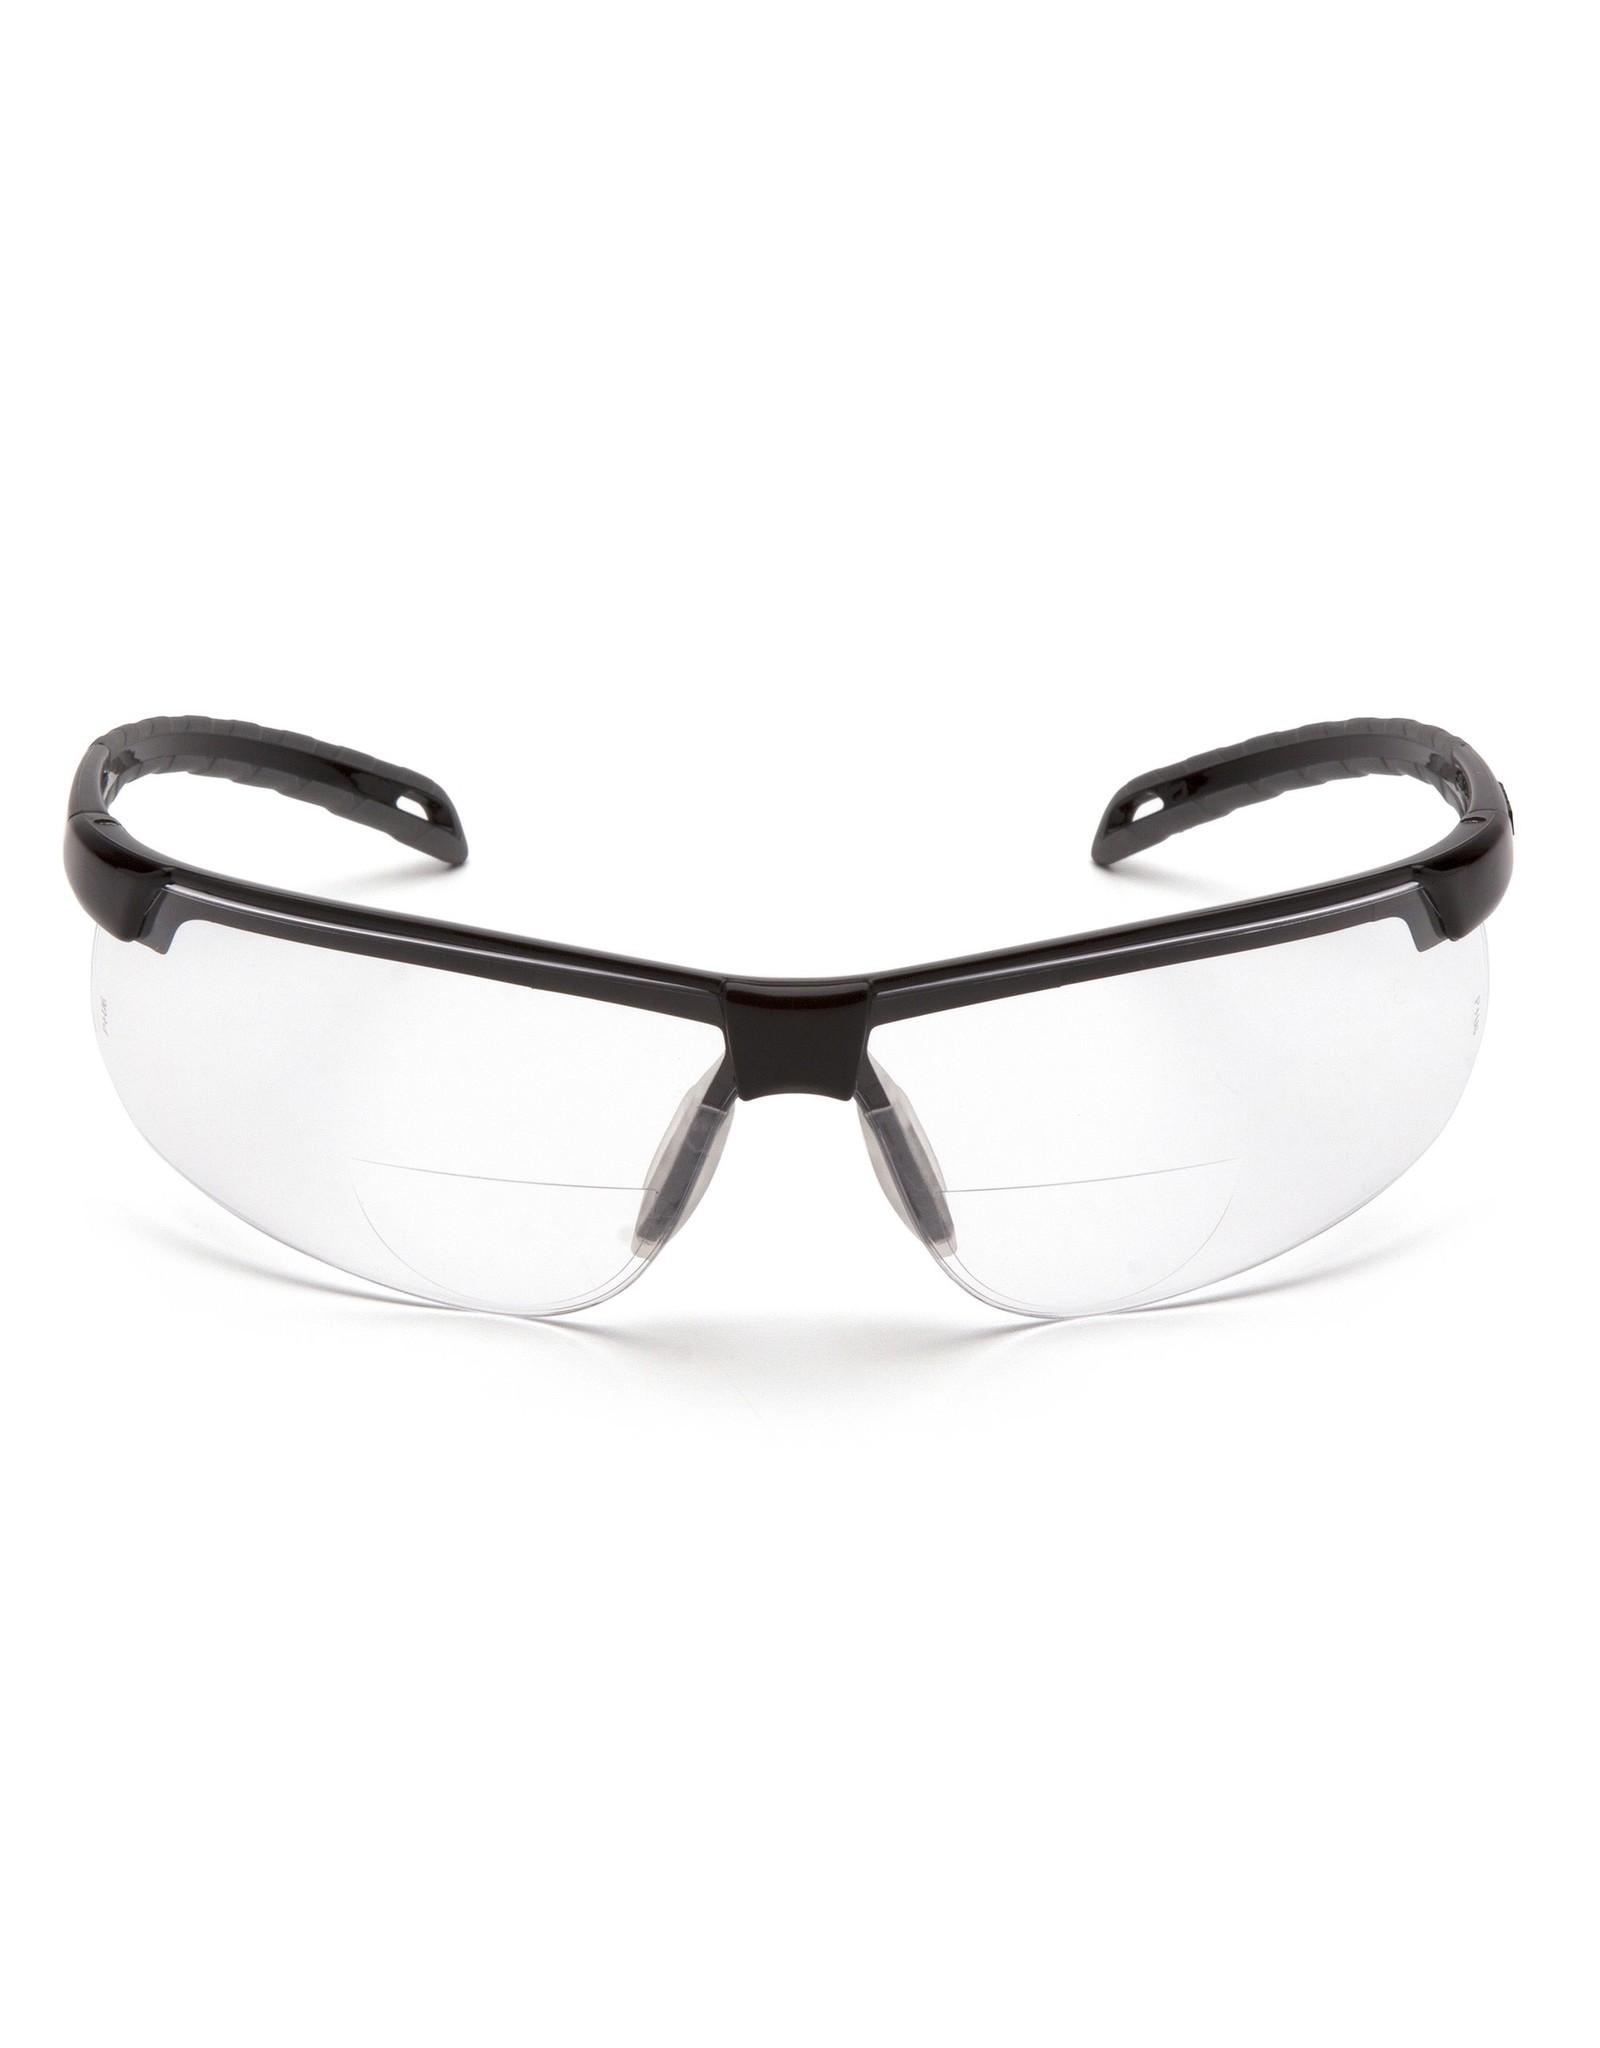 Pyramex Pyramex Ever-Lite Safety Glasses/Reading Glasses